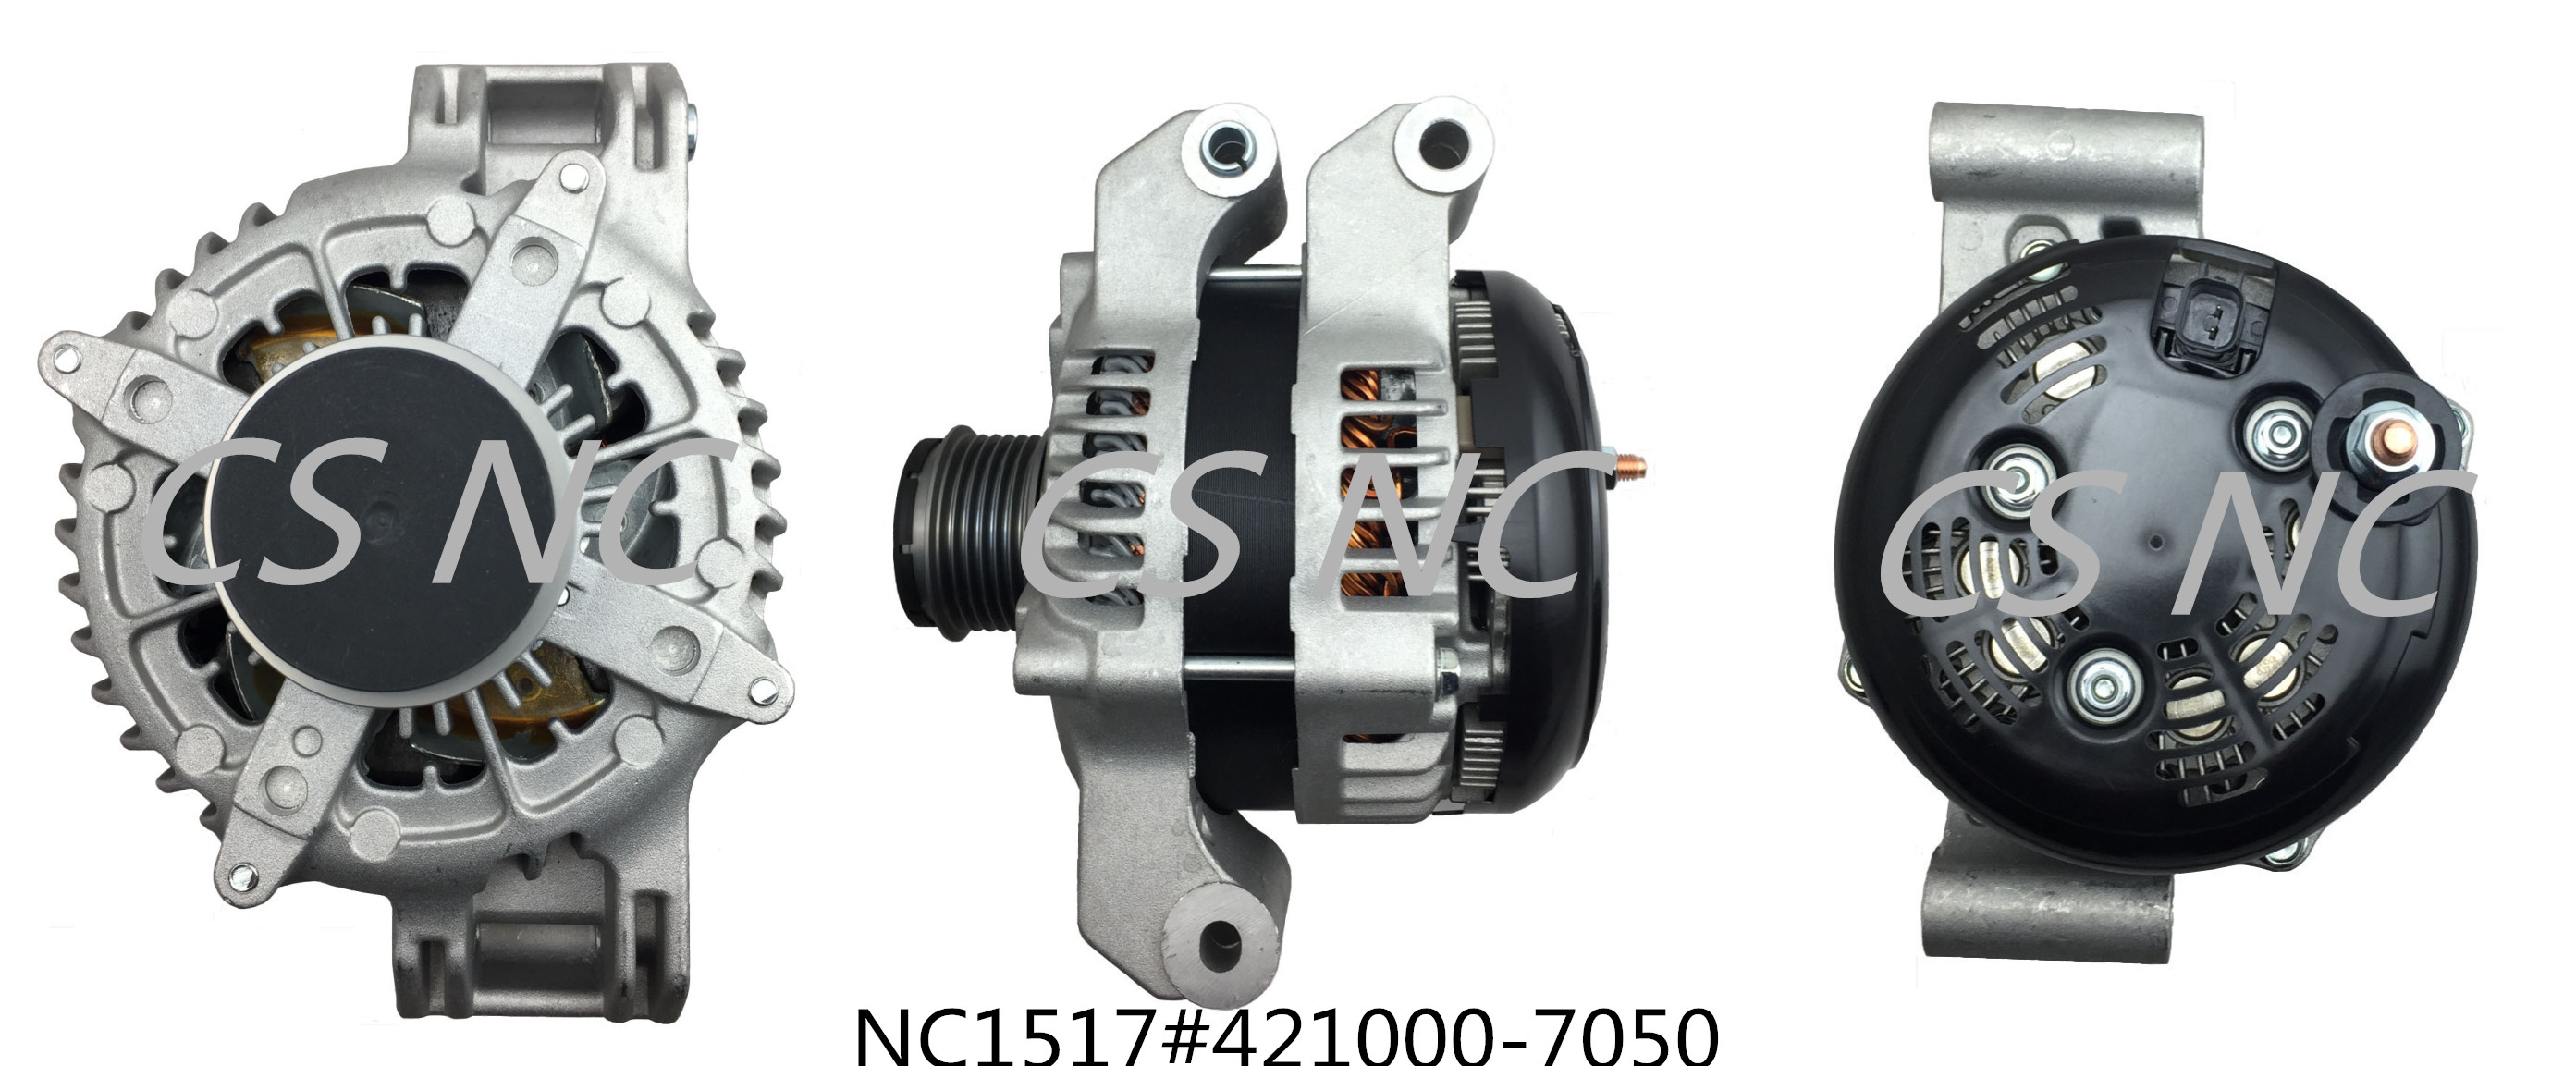 Denso Alternator NC1517 (12V 220A, 421000-7050)